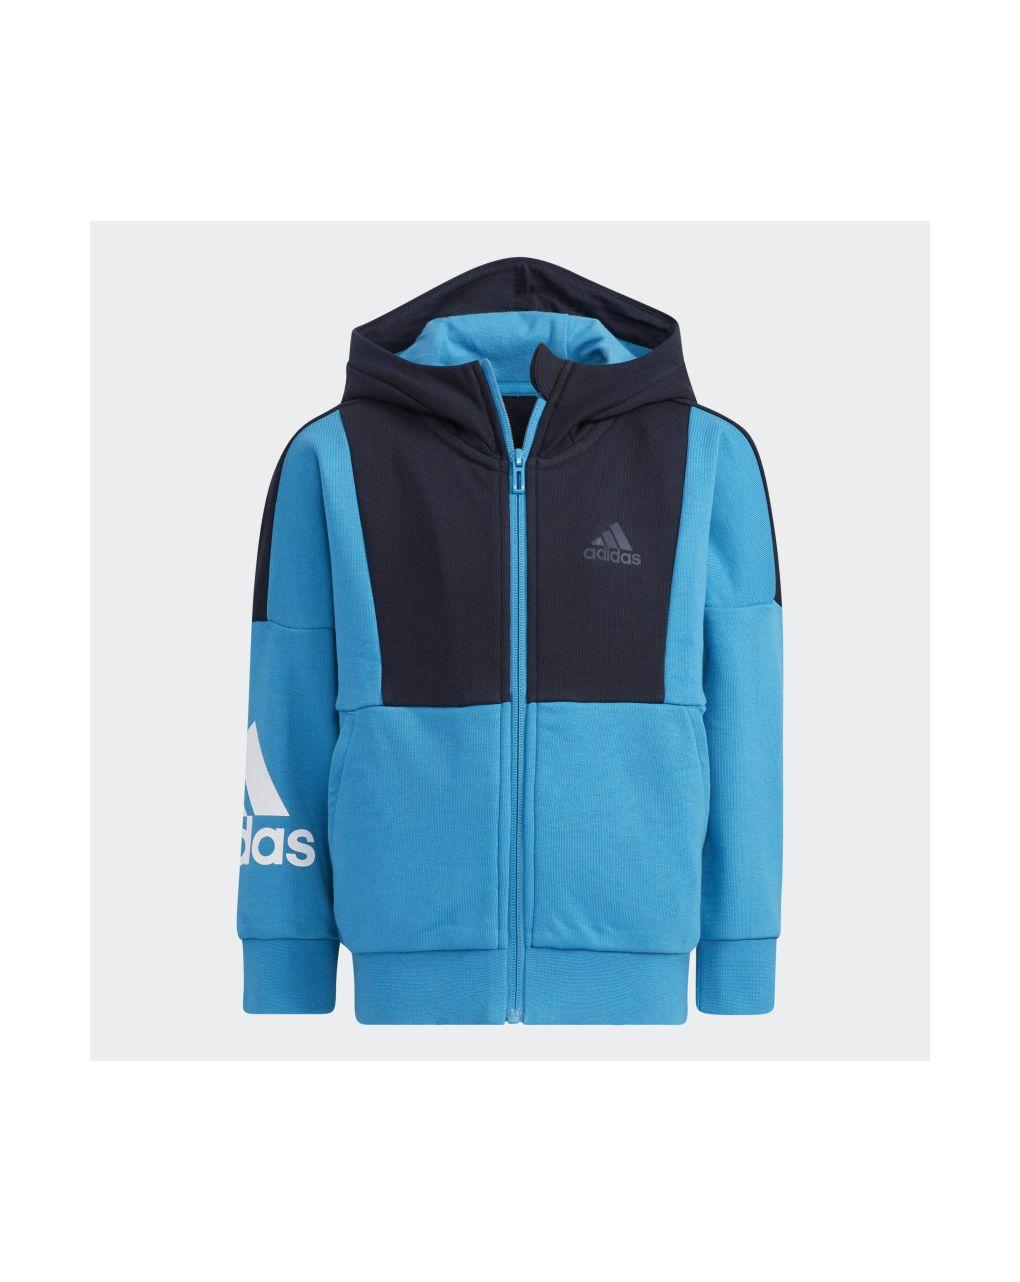 Adidas Ζακέτα Φόρμας Aeroready Badge of Sport Μπλε για Αγόρι H40258